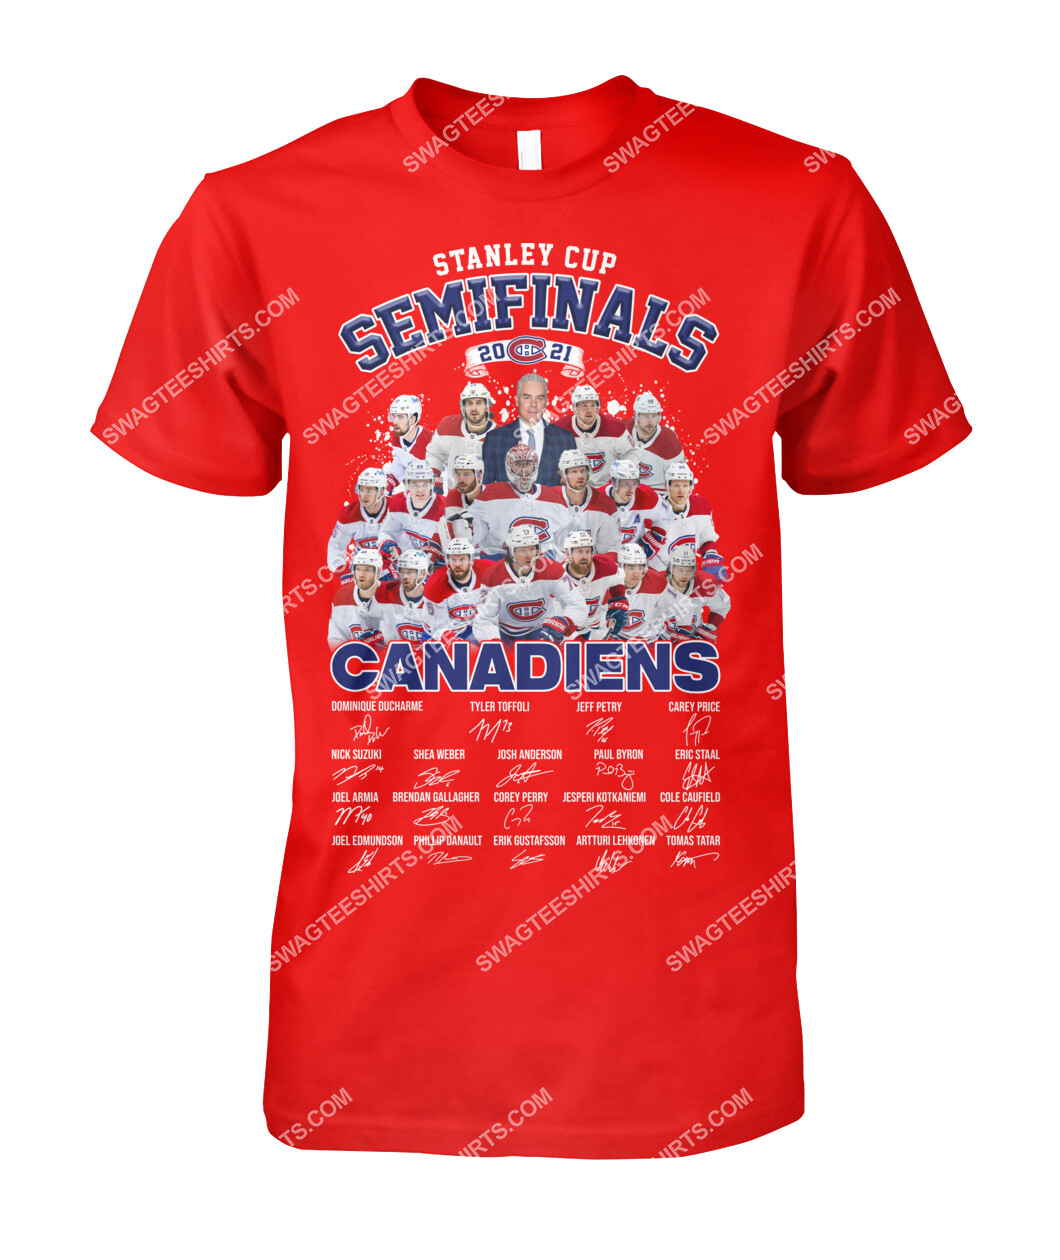 astanley cup semifinals 2021 montreal canadiens signatures tshirt 1